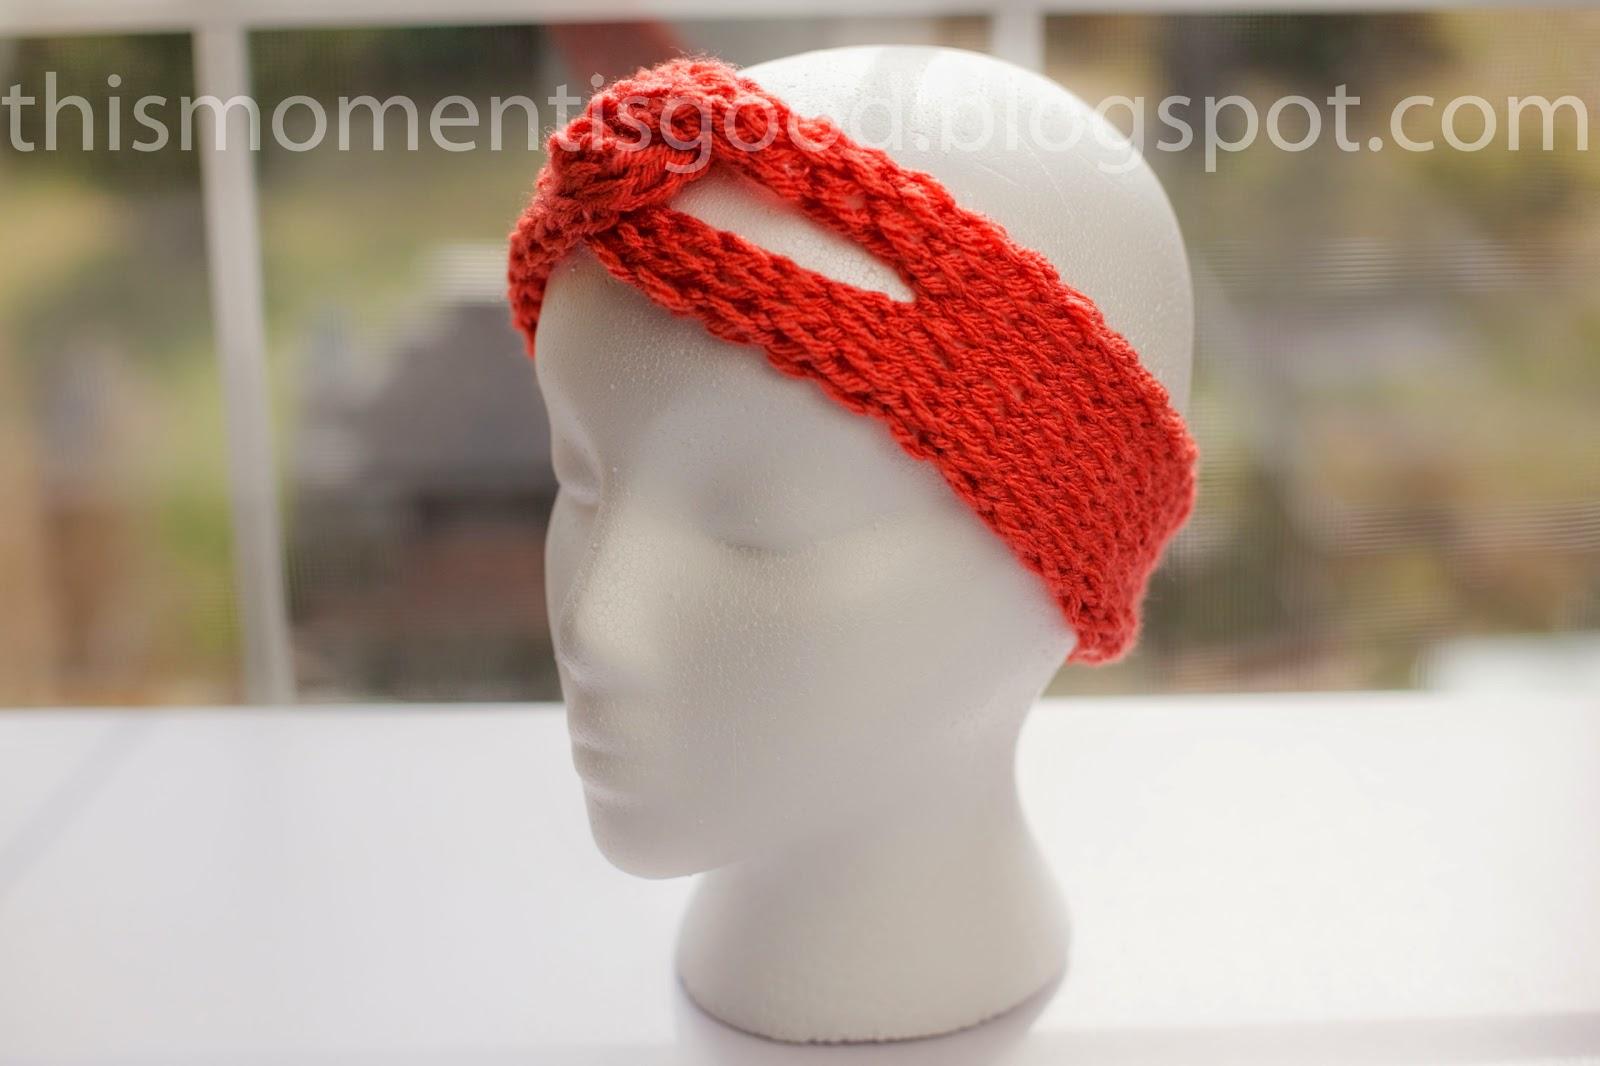 Loom Knit Headband Pattern : This Moment is Good...